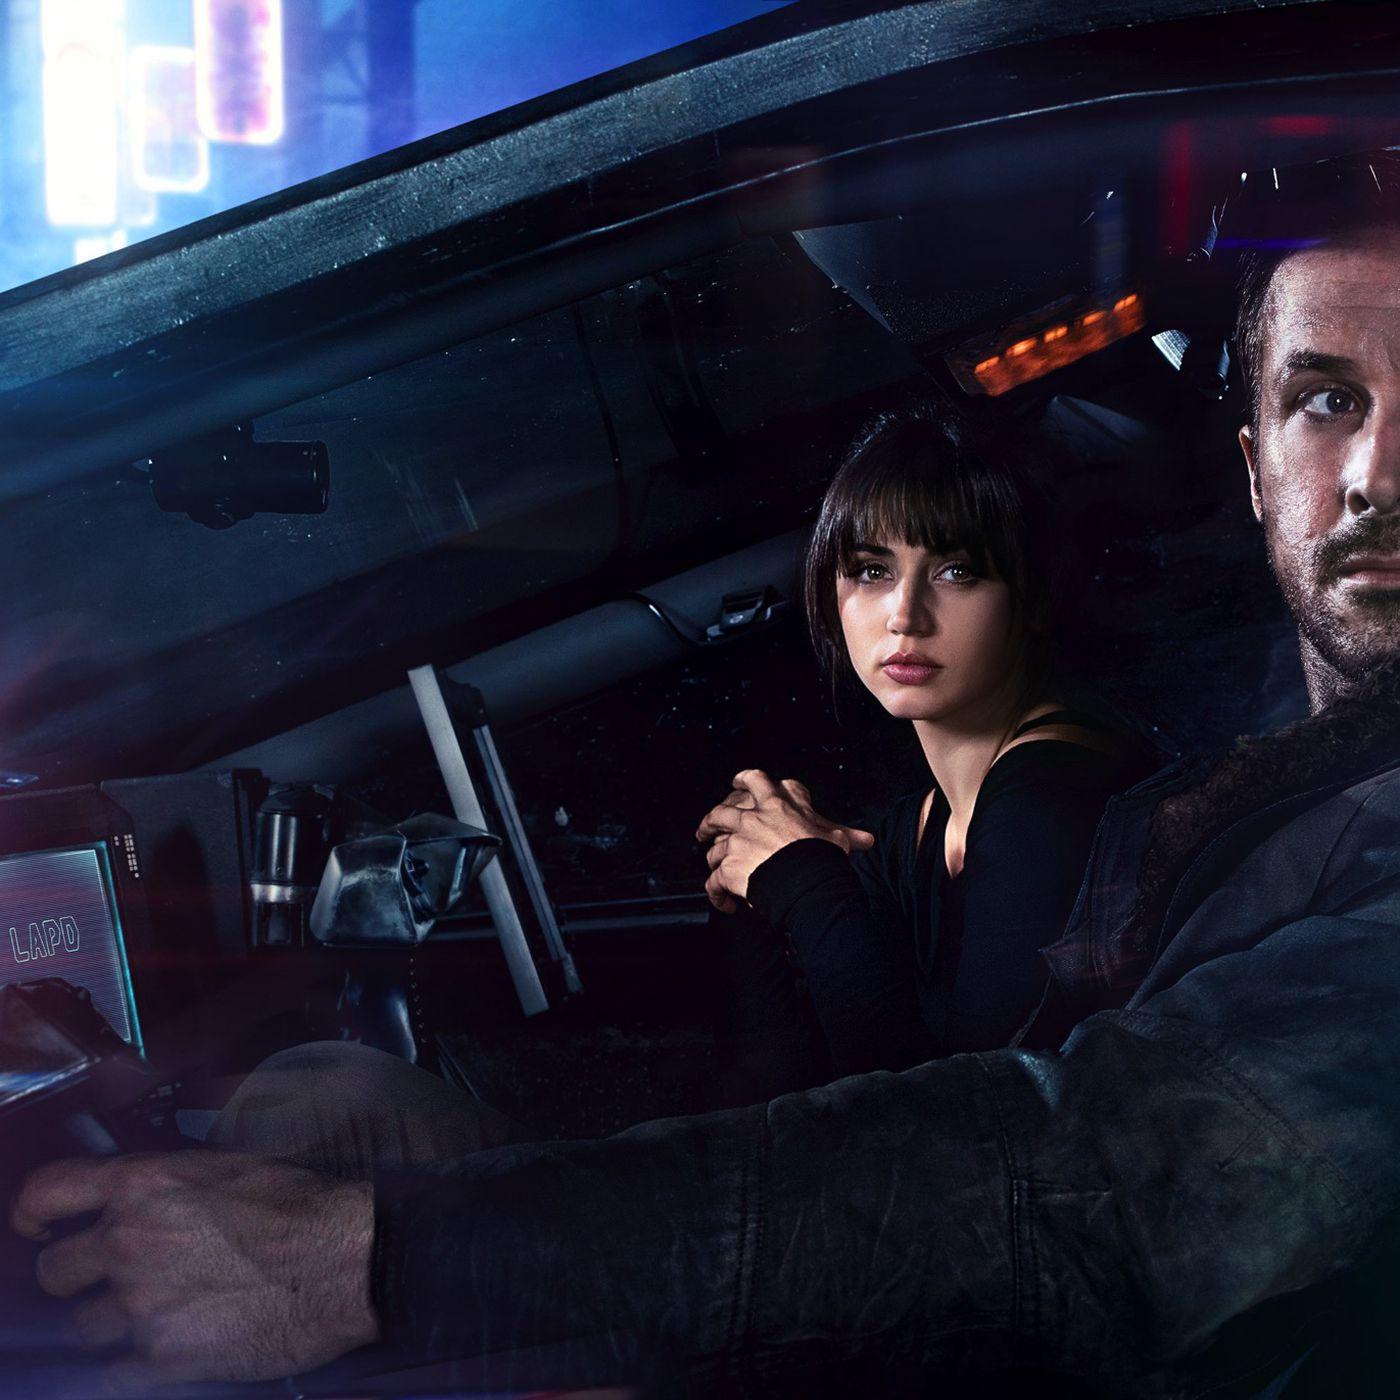 Blade Runner 2049 2040 The Best Movies On Netflix In 2019